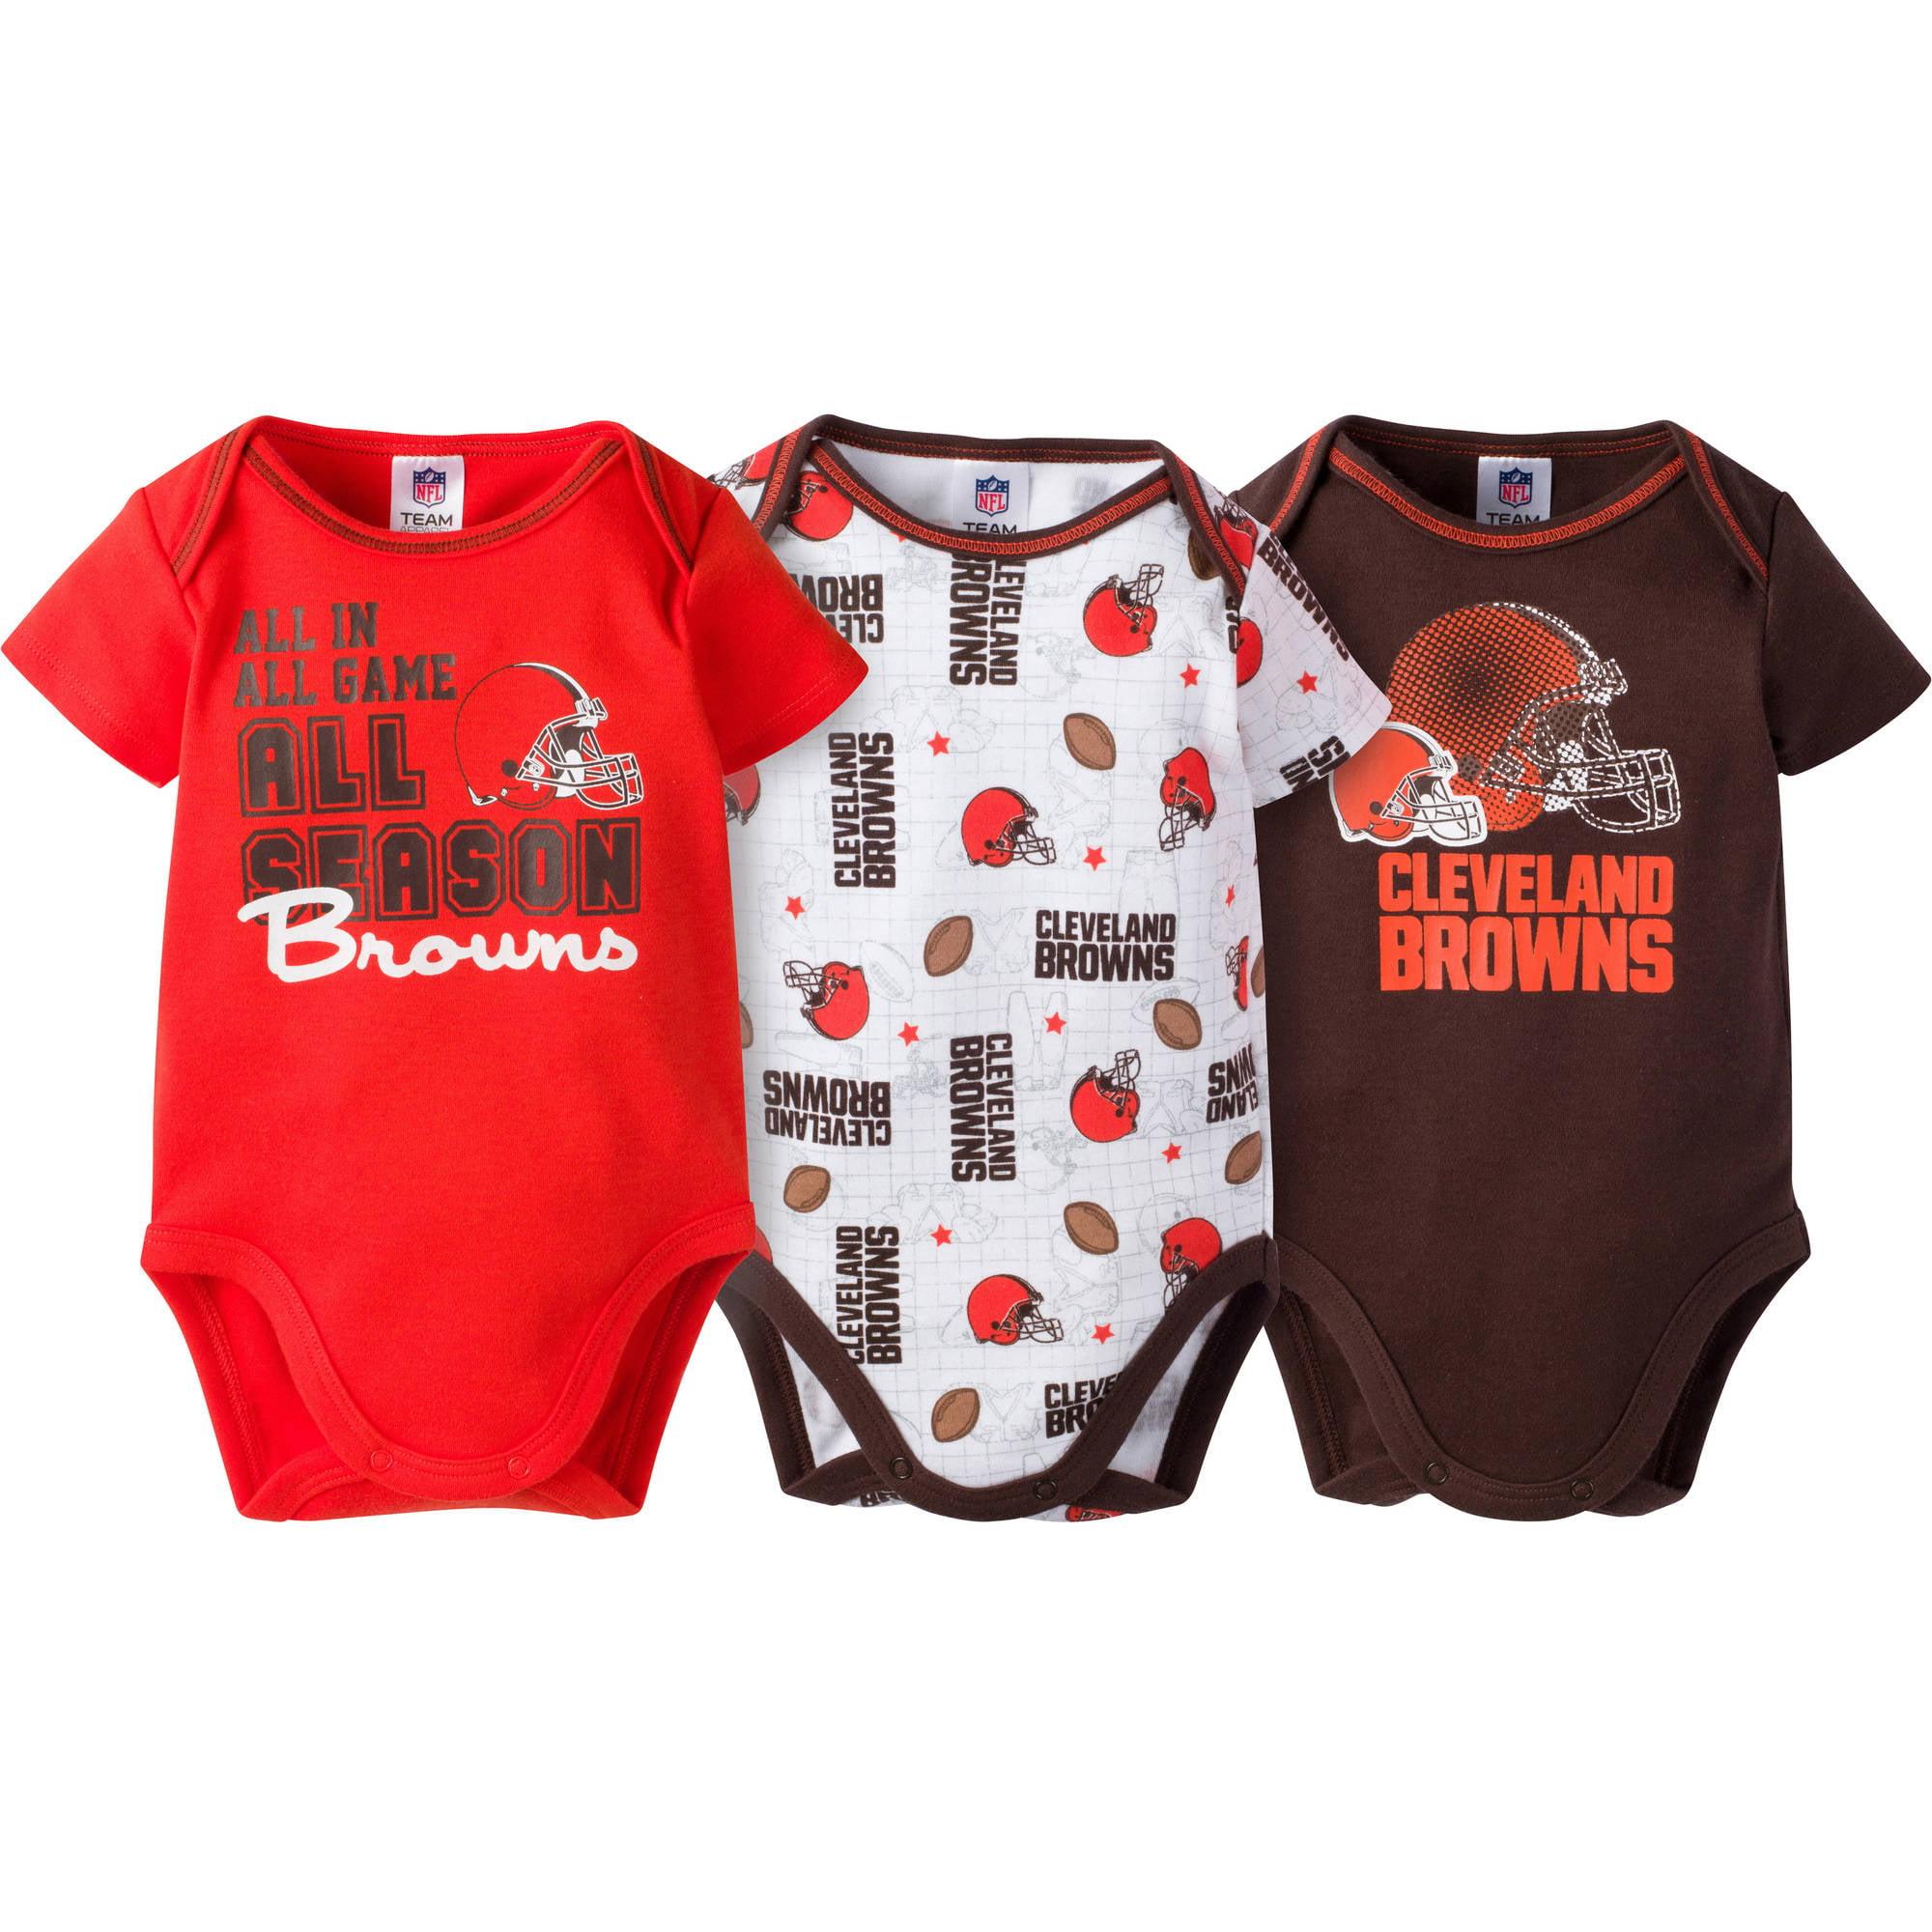 NFL Cleveland Browns Baby Boys Short Sleeve Bodysuit Set, 3-Pack